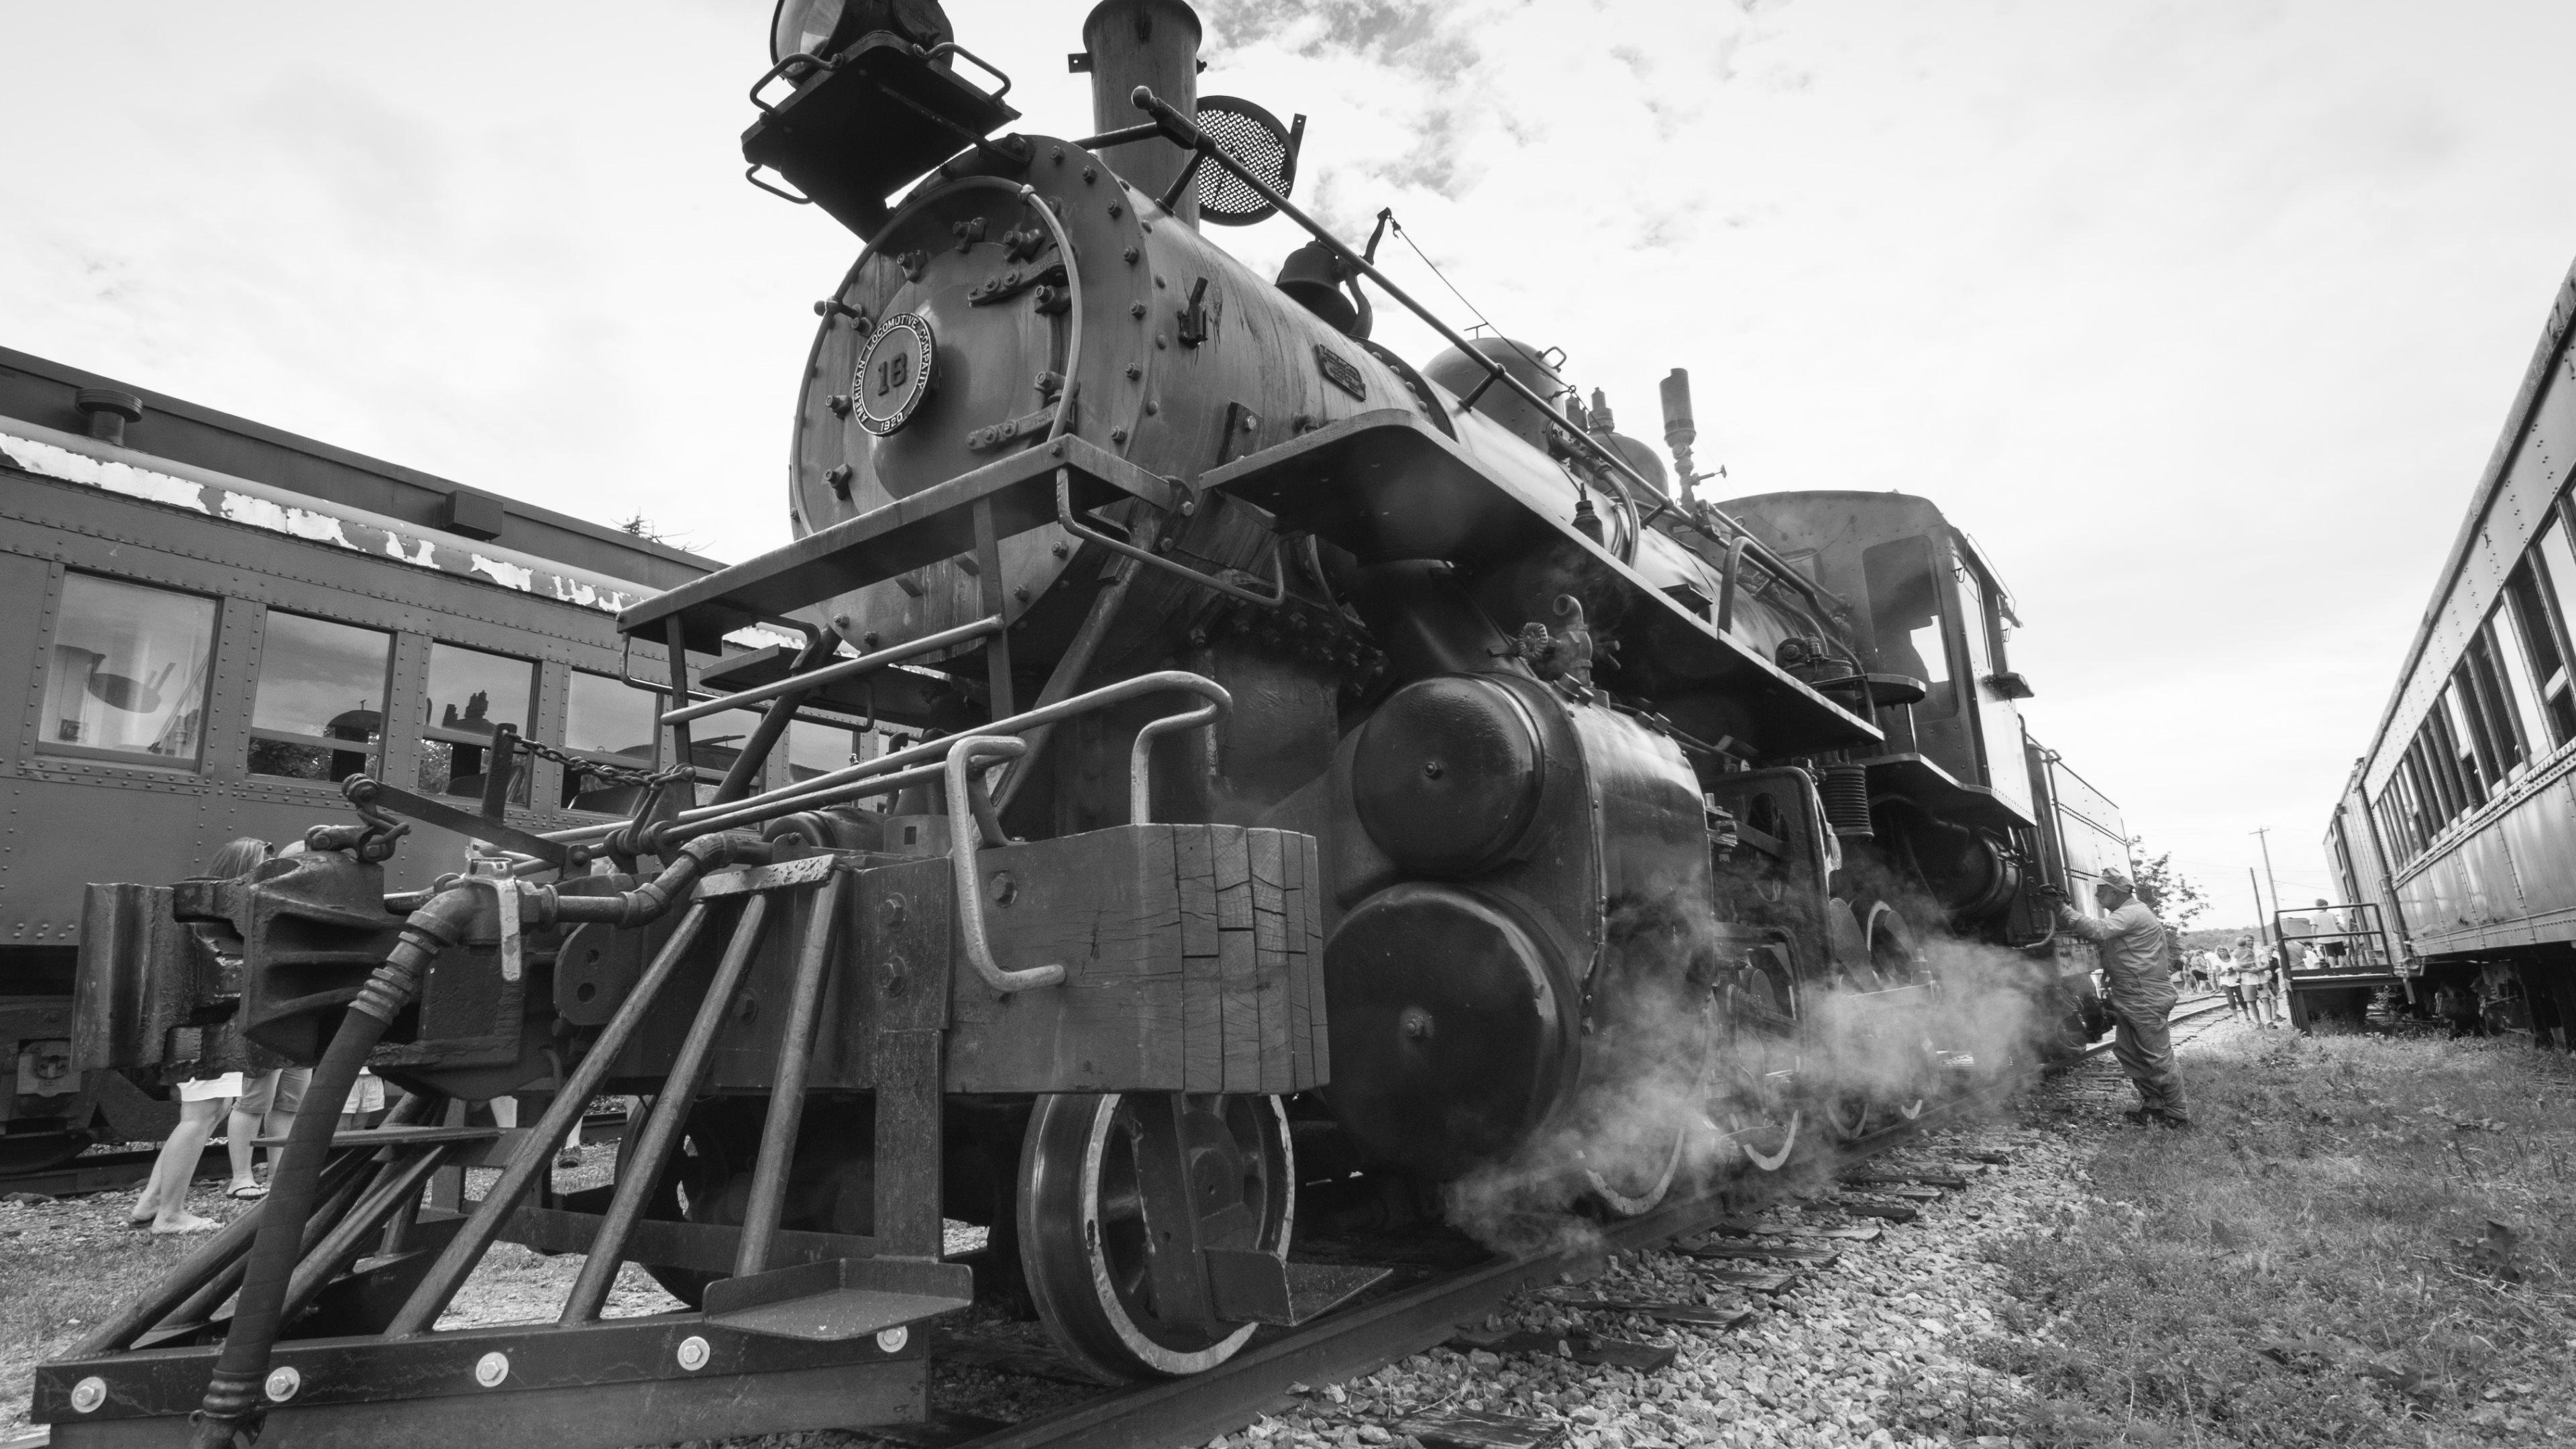 steam locomotive hd wallpapers - photo #26